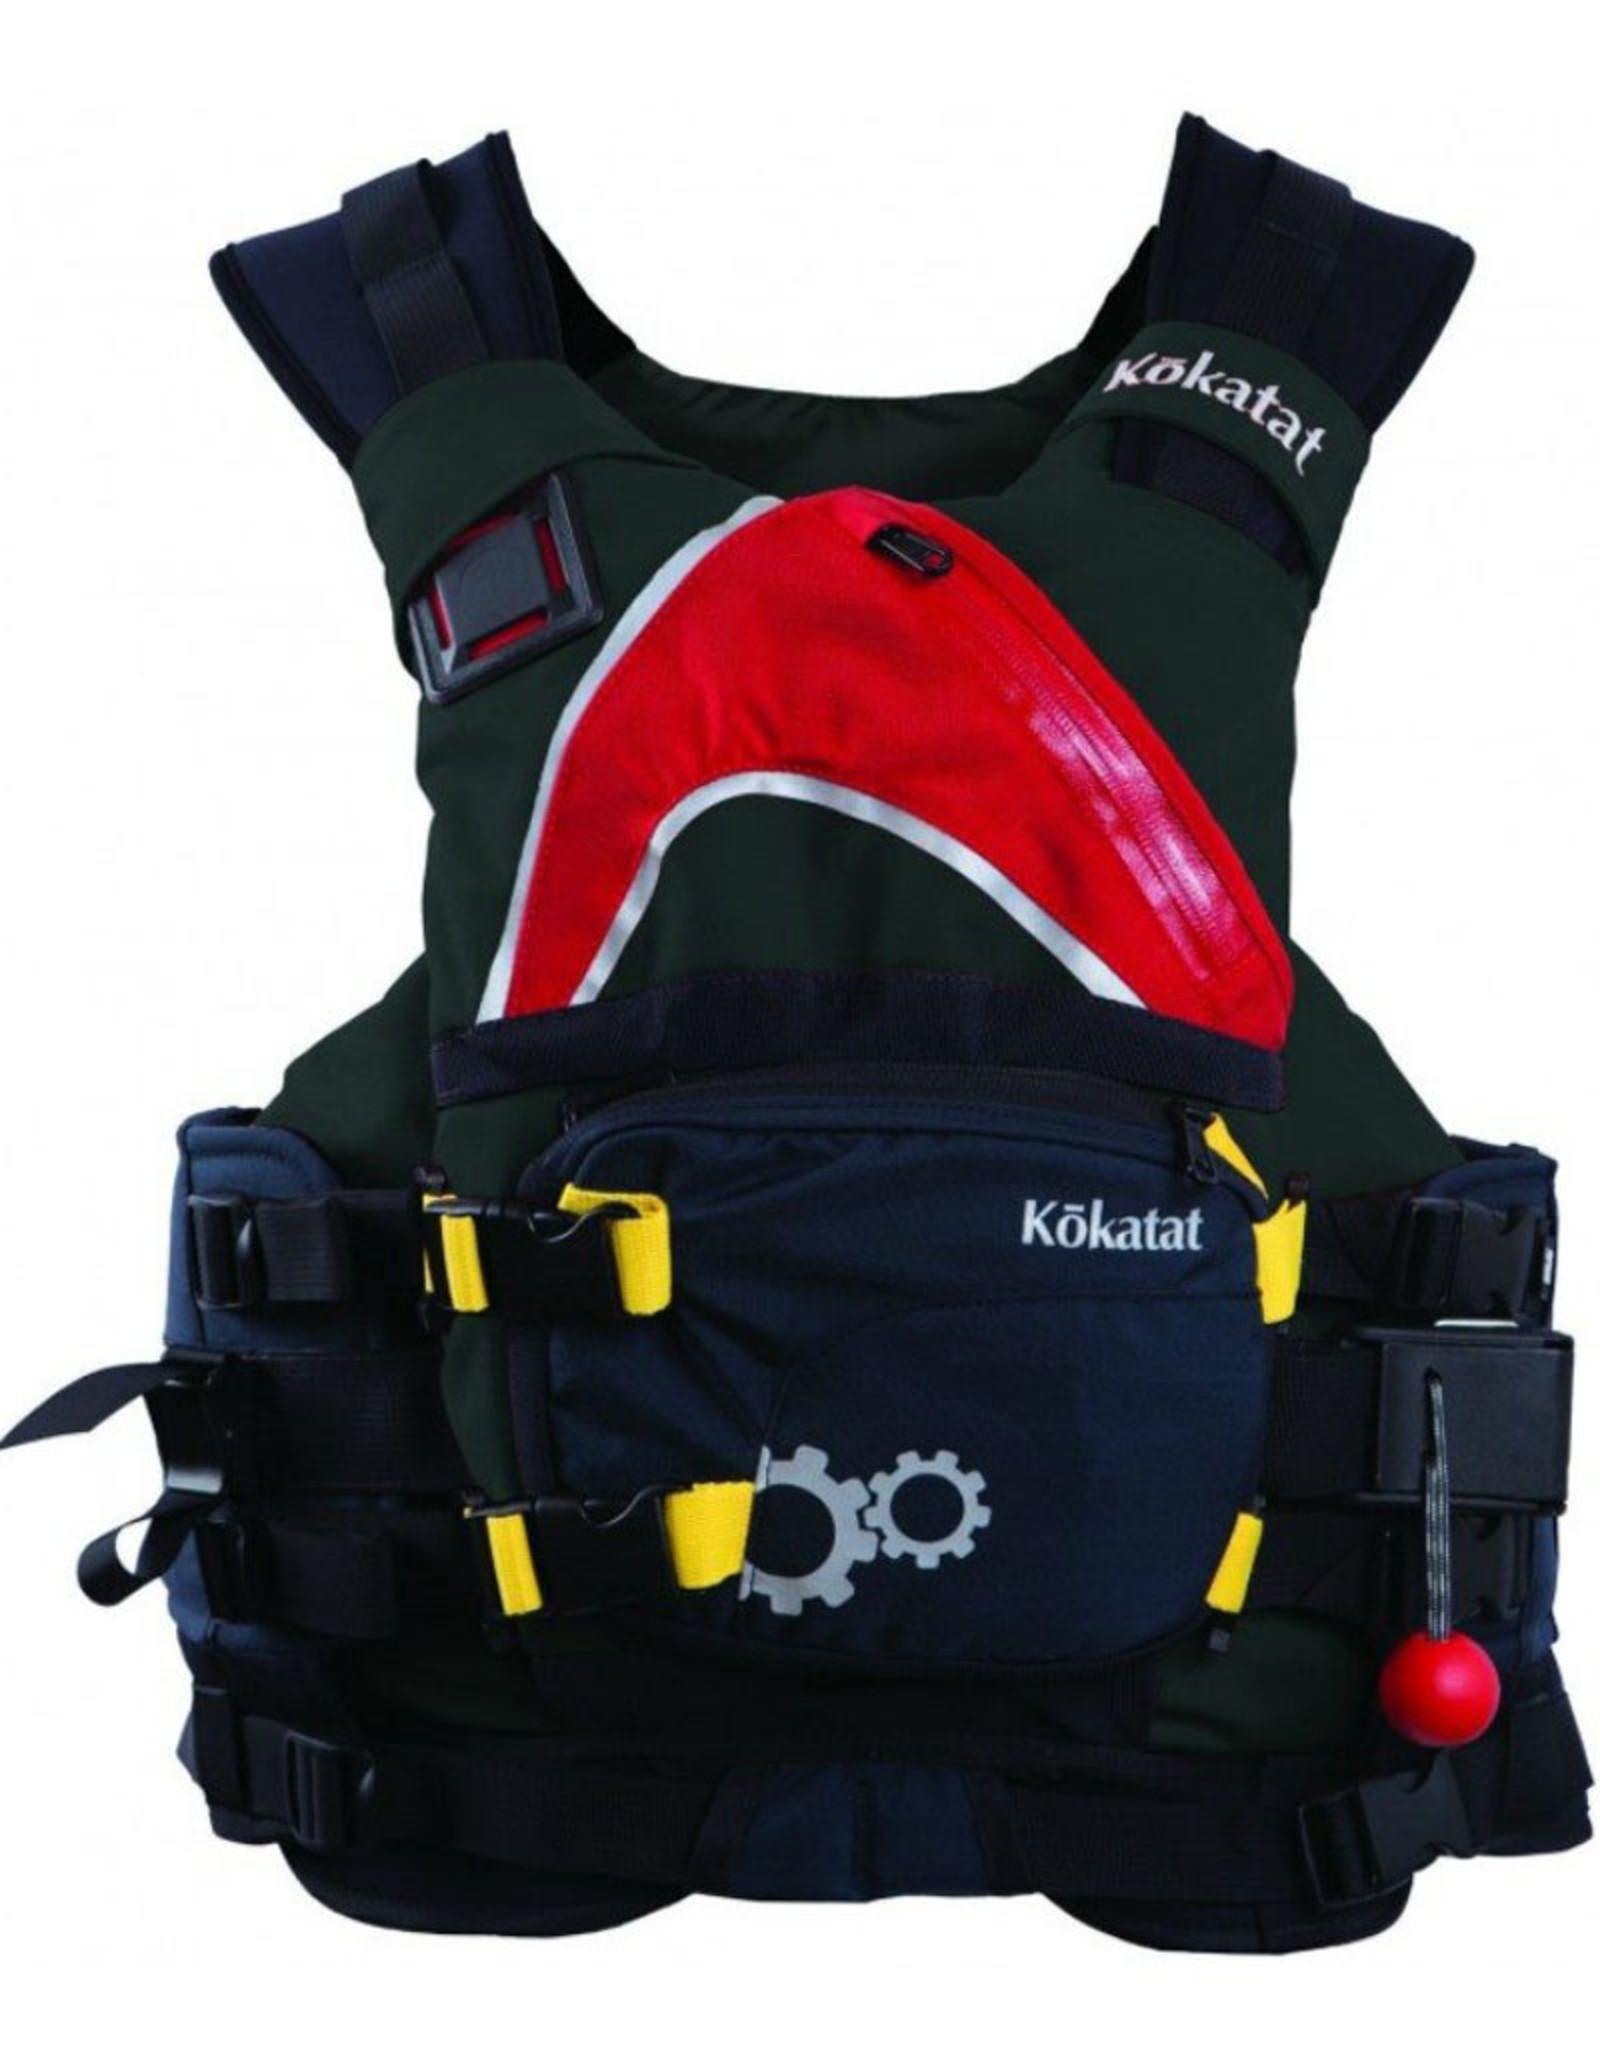 Kokatat Kokatat Maximus Centurion Rescue PFD -Discont.